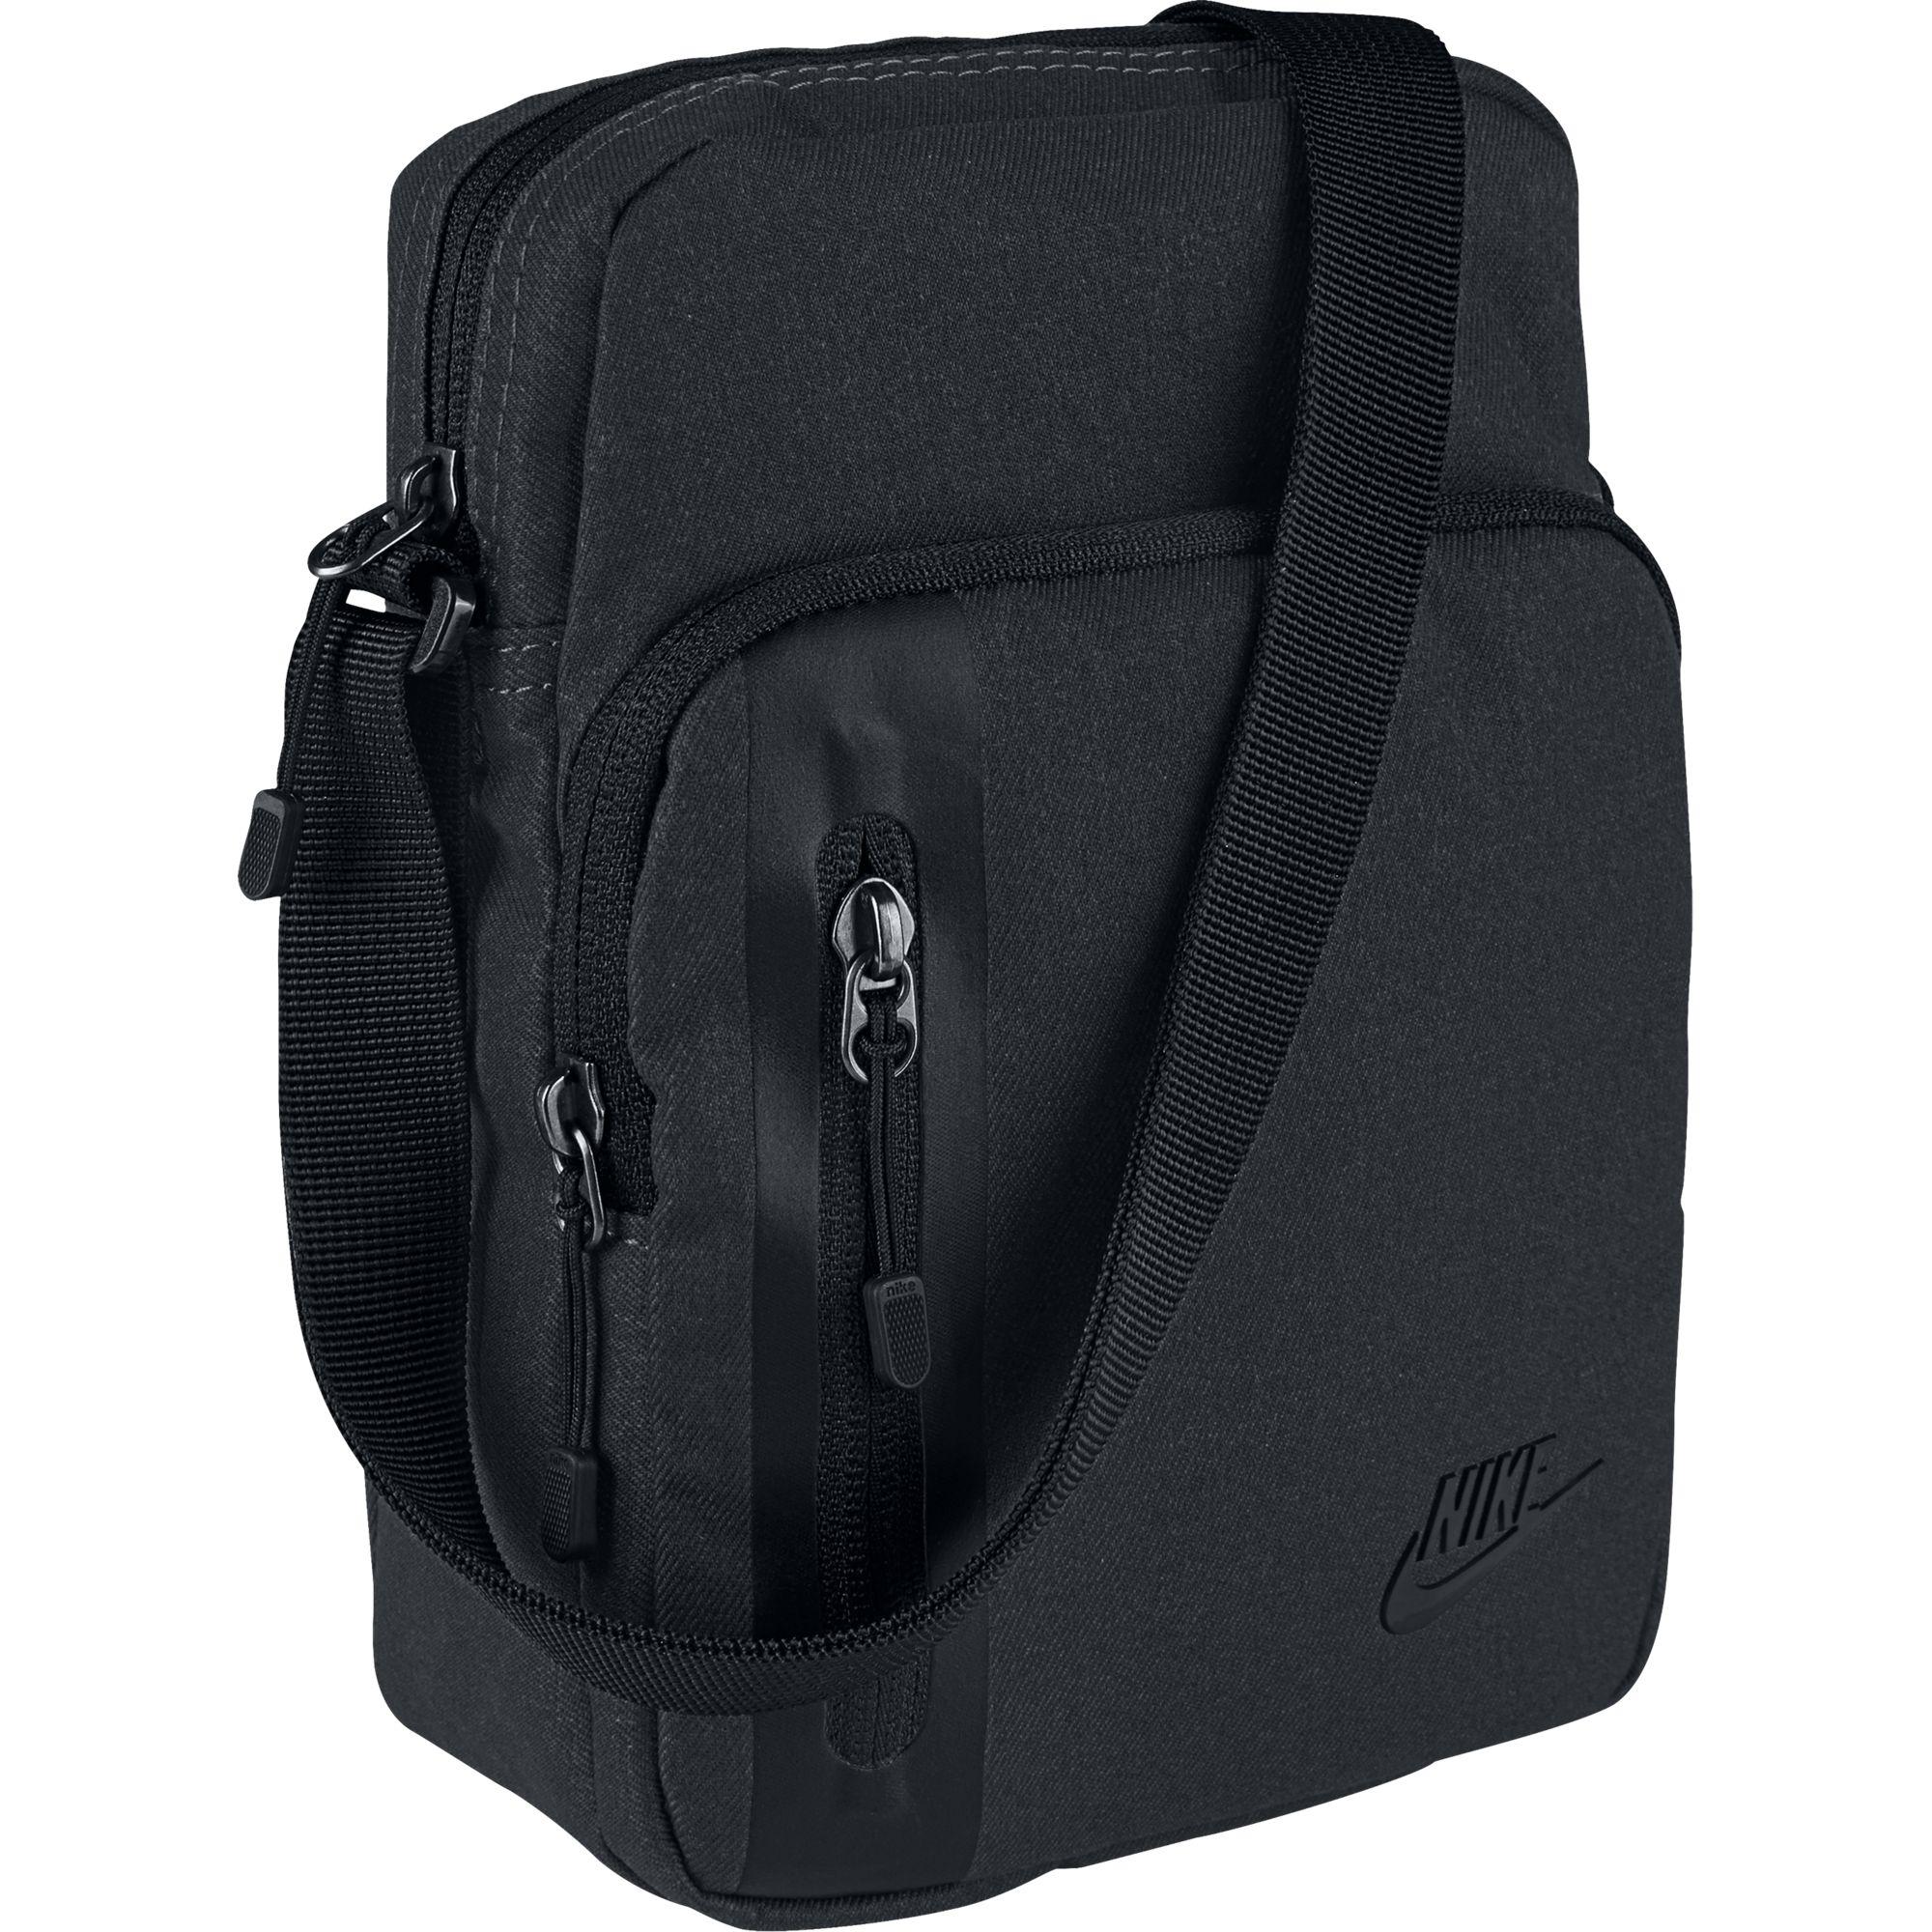 2bae2c6baf12 Nike Core Tech Messenger Shoulder Small Mini Crossbody Bag Organizer ...